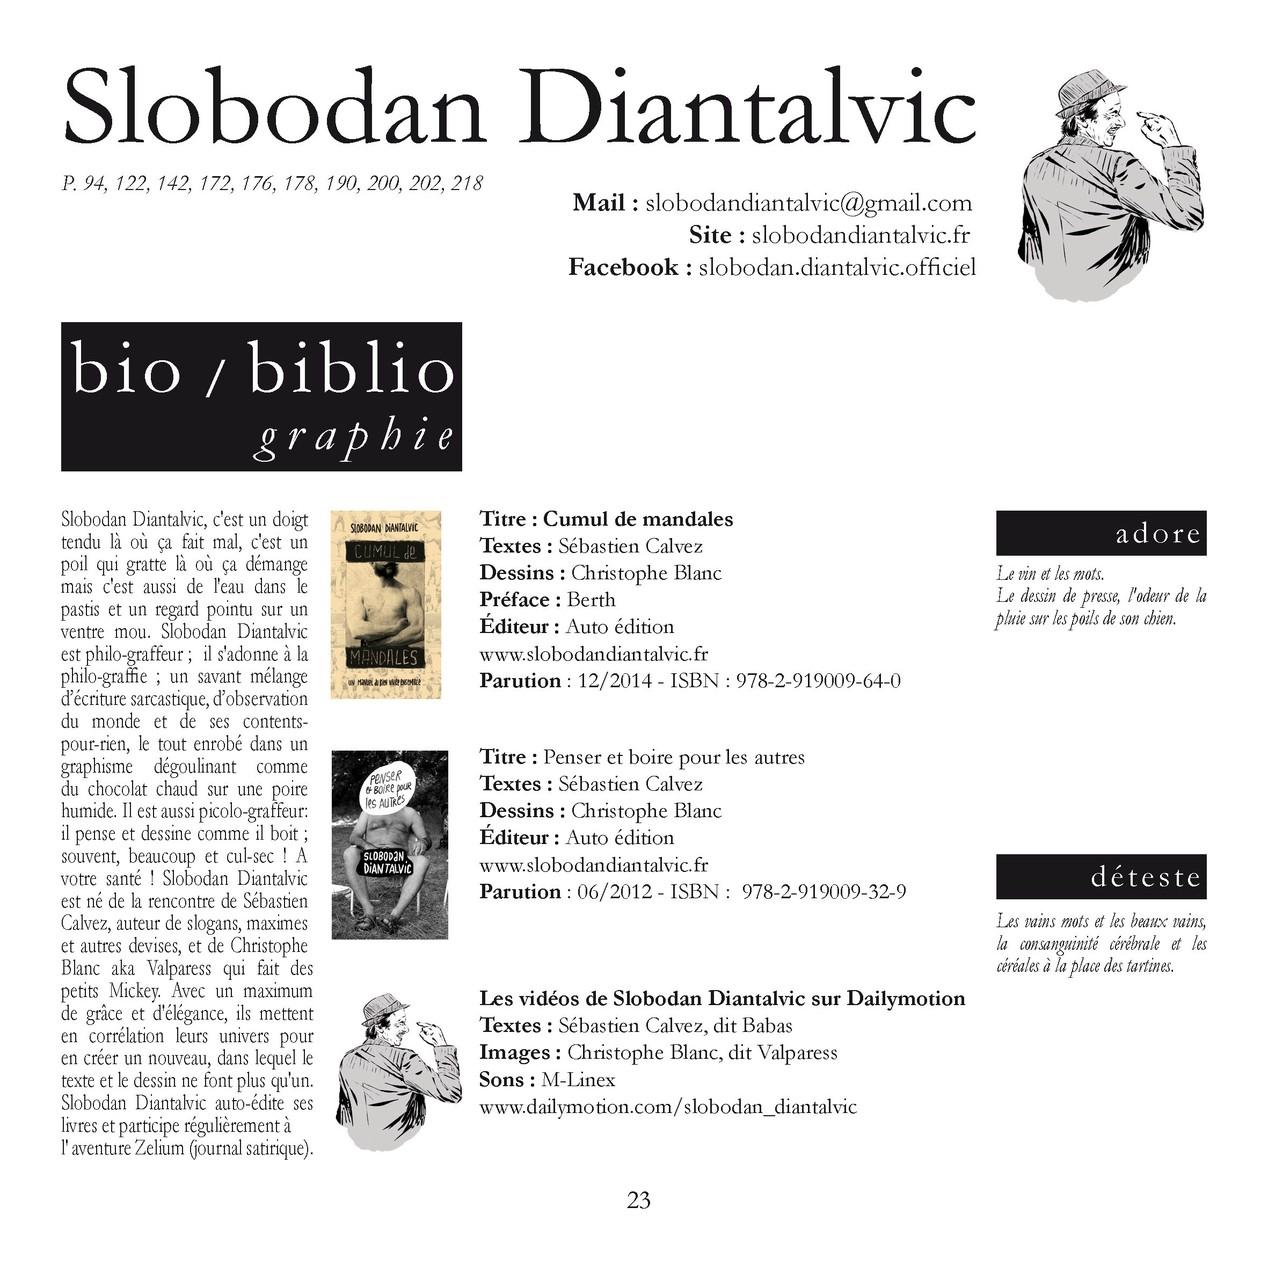 SLOBODAN DIANTALVIC